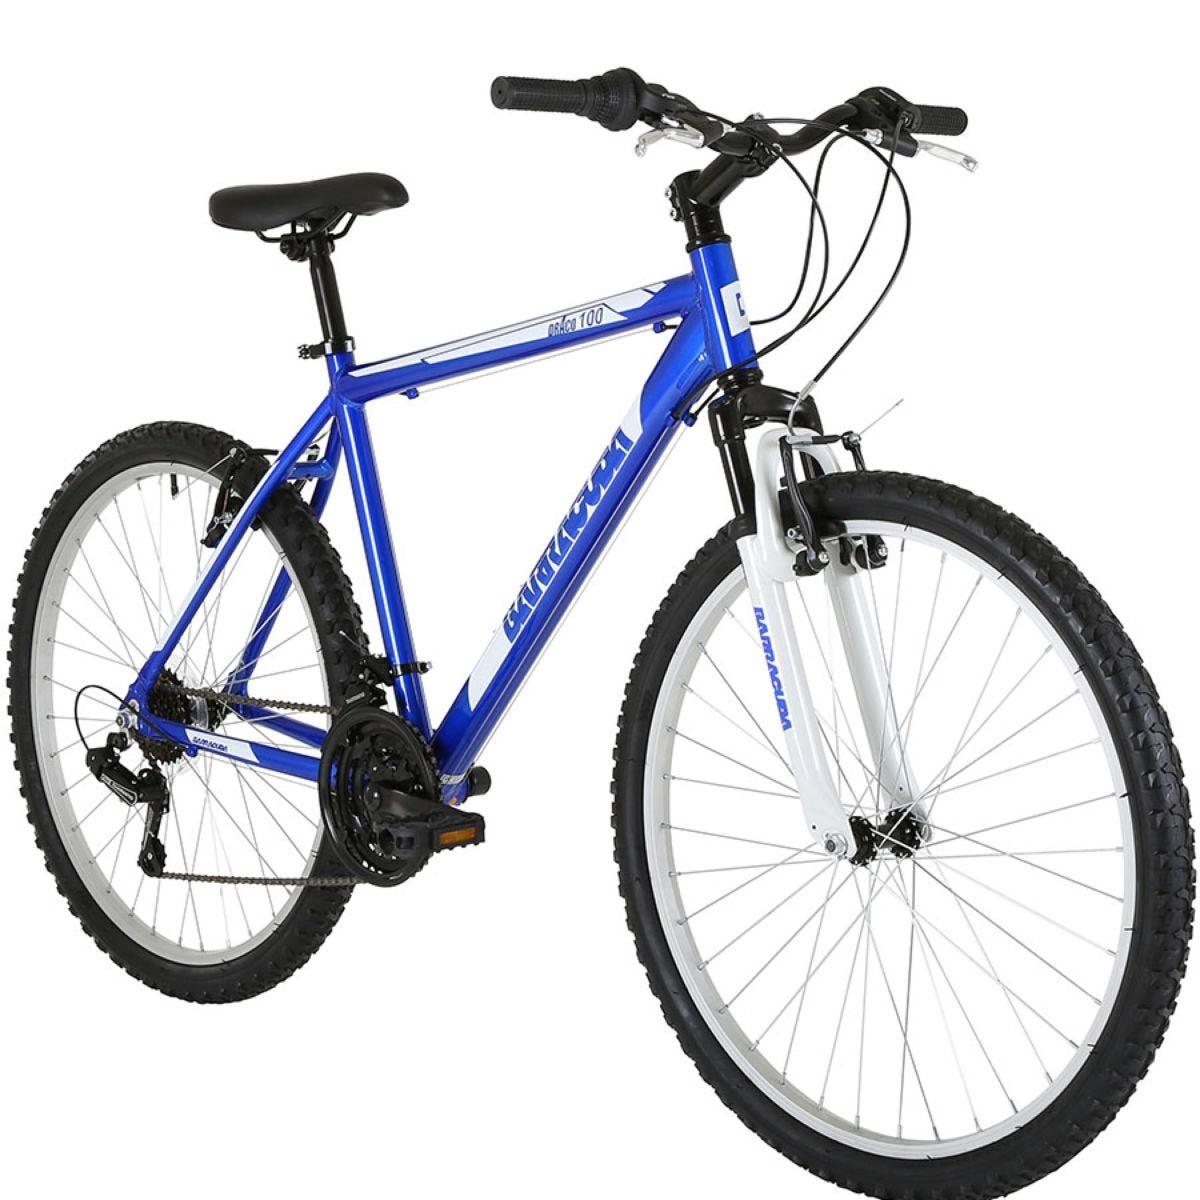 Barracuda Draco Men's Mountain Bike 21-Inch - Blue